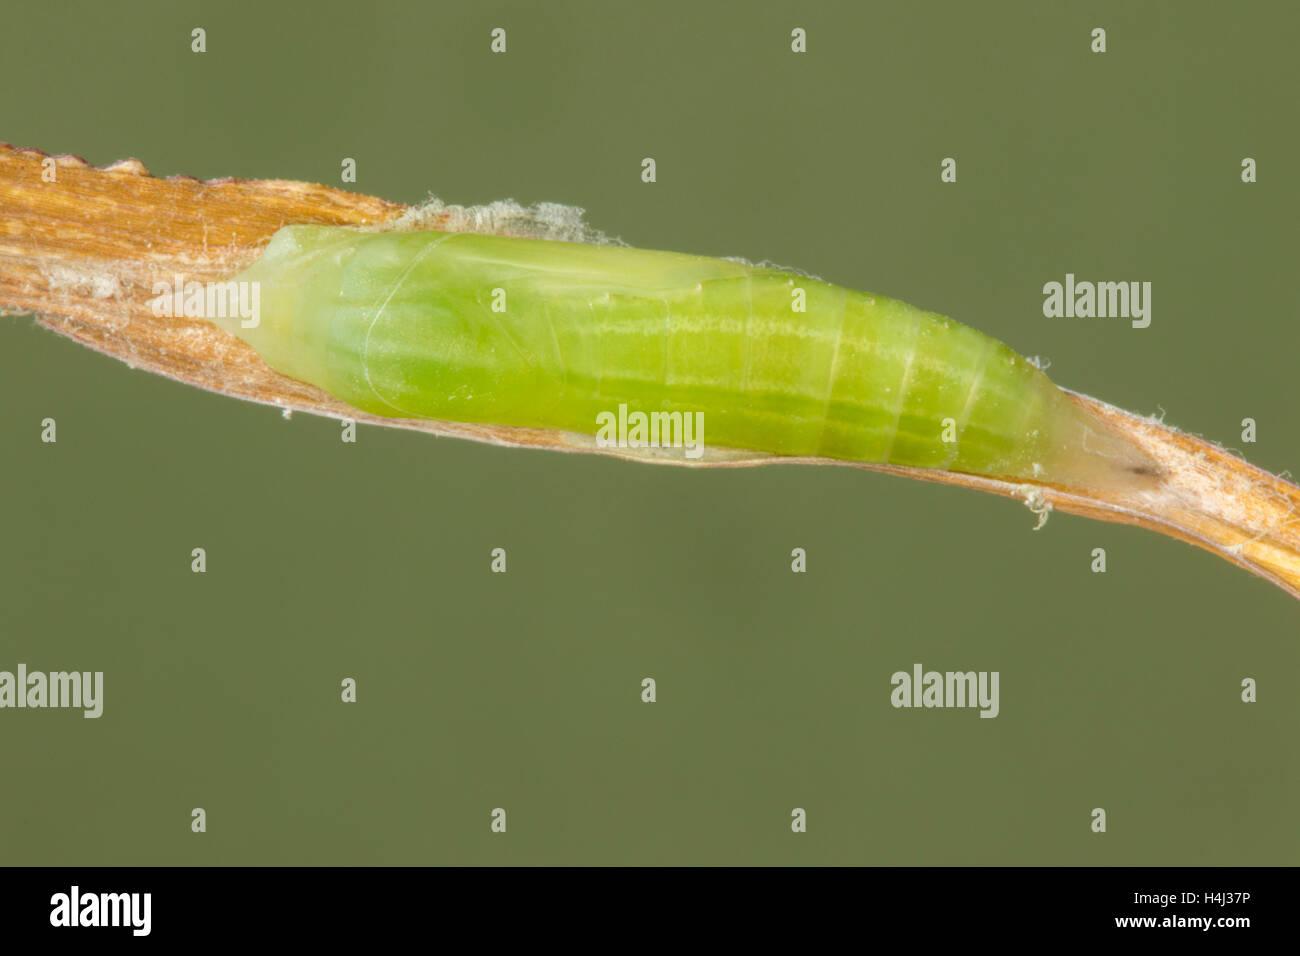 Eufala Skipper  Lerodea eufala Tucson, Arizona 10 October 2016      chrysalis or pupa     Hesperiidae    Pyrginae - Stock Image